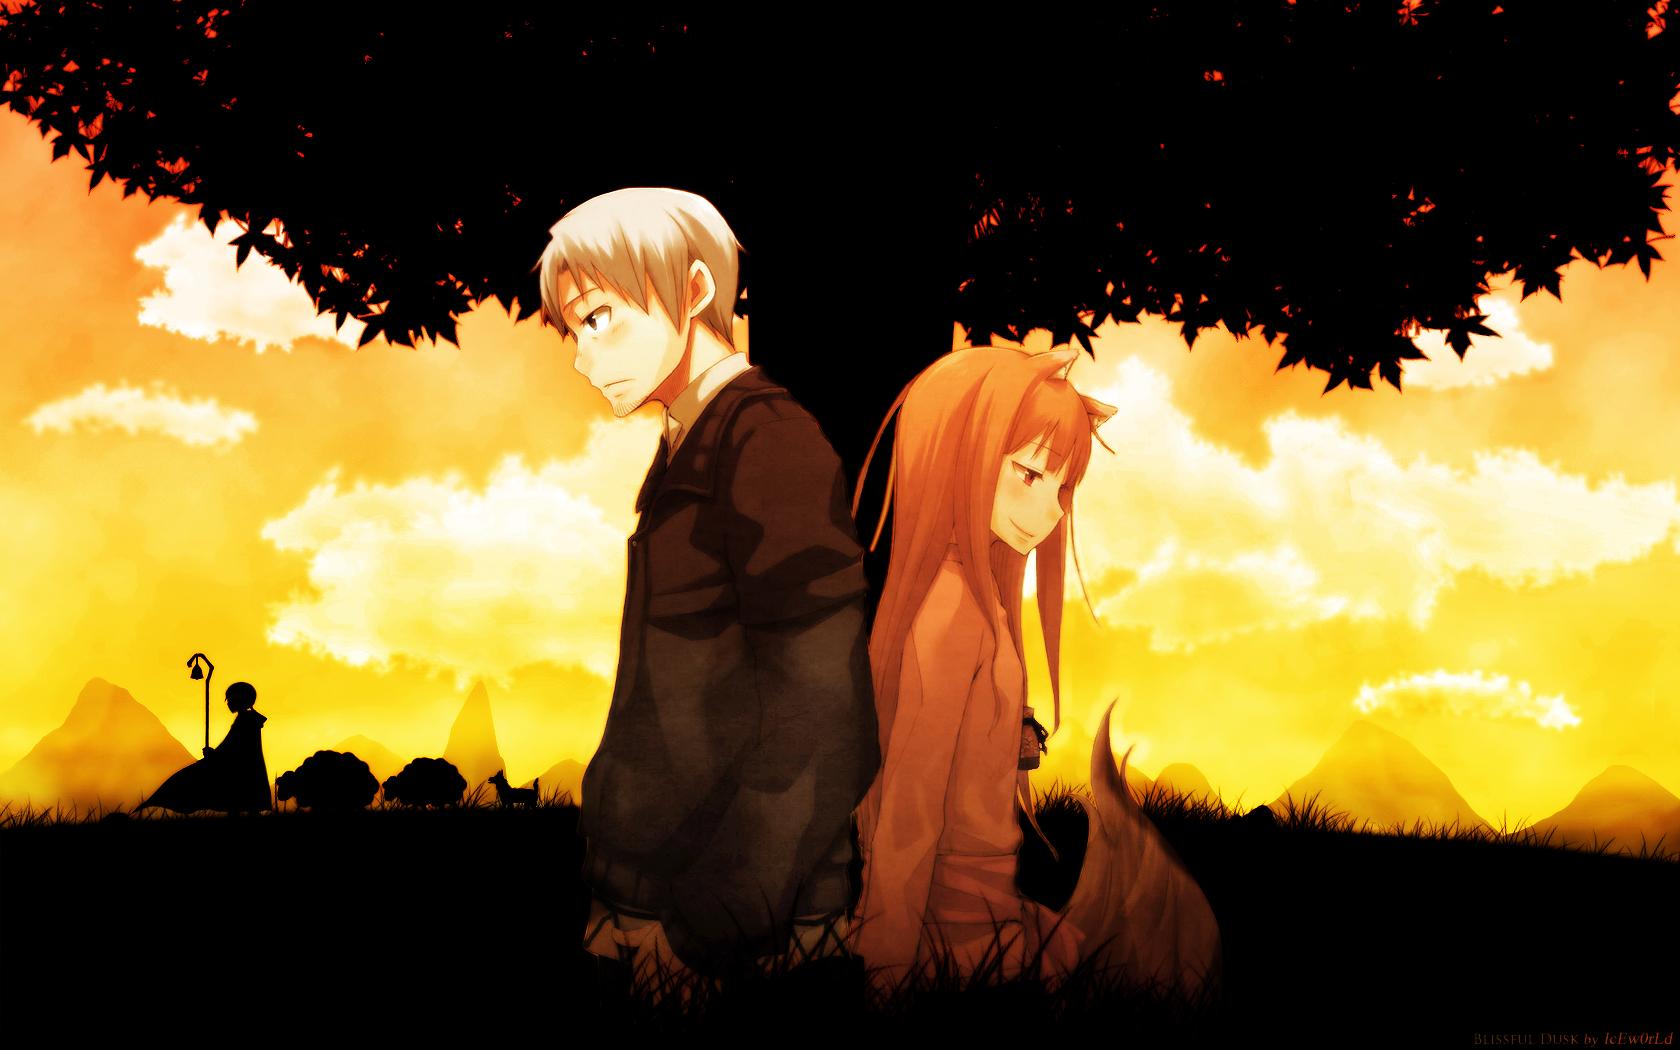 Manga Anime Love Wallpaper Wallpapers Tumblr